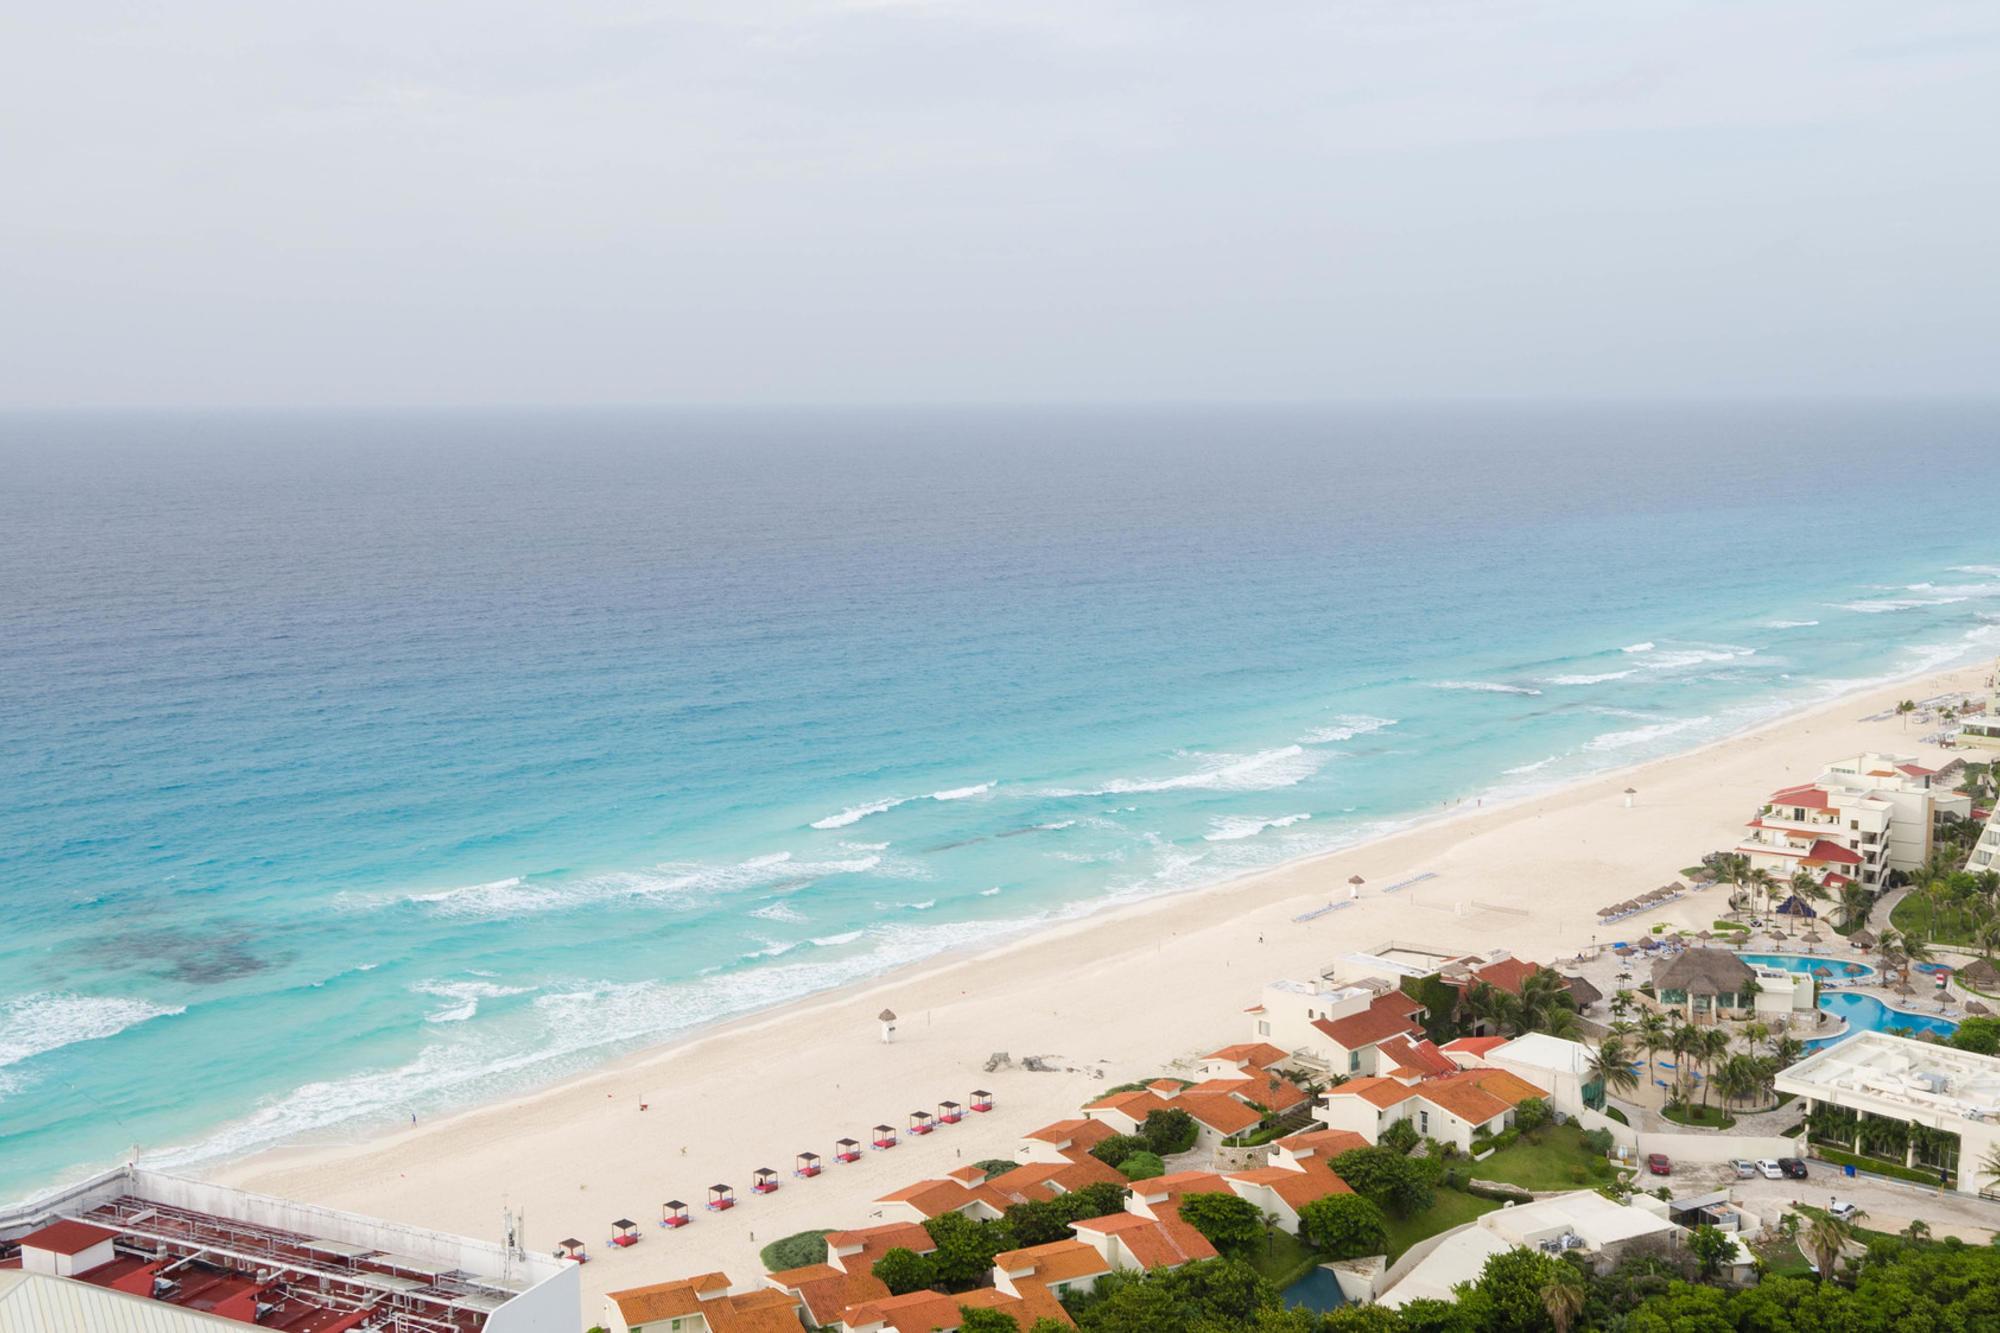 Le Blanc Spa Resort Cancun aerial